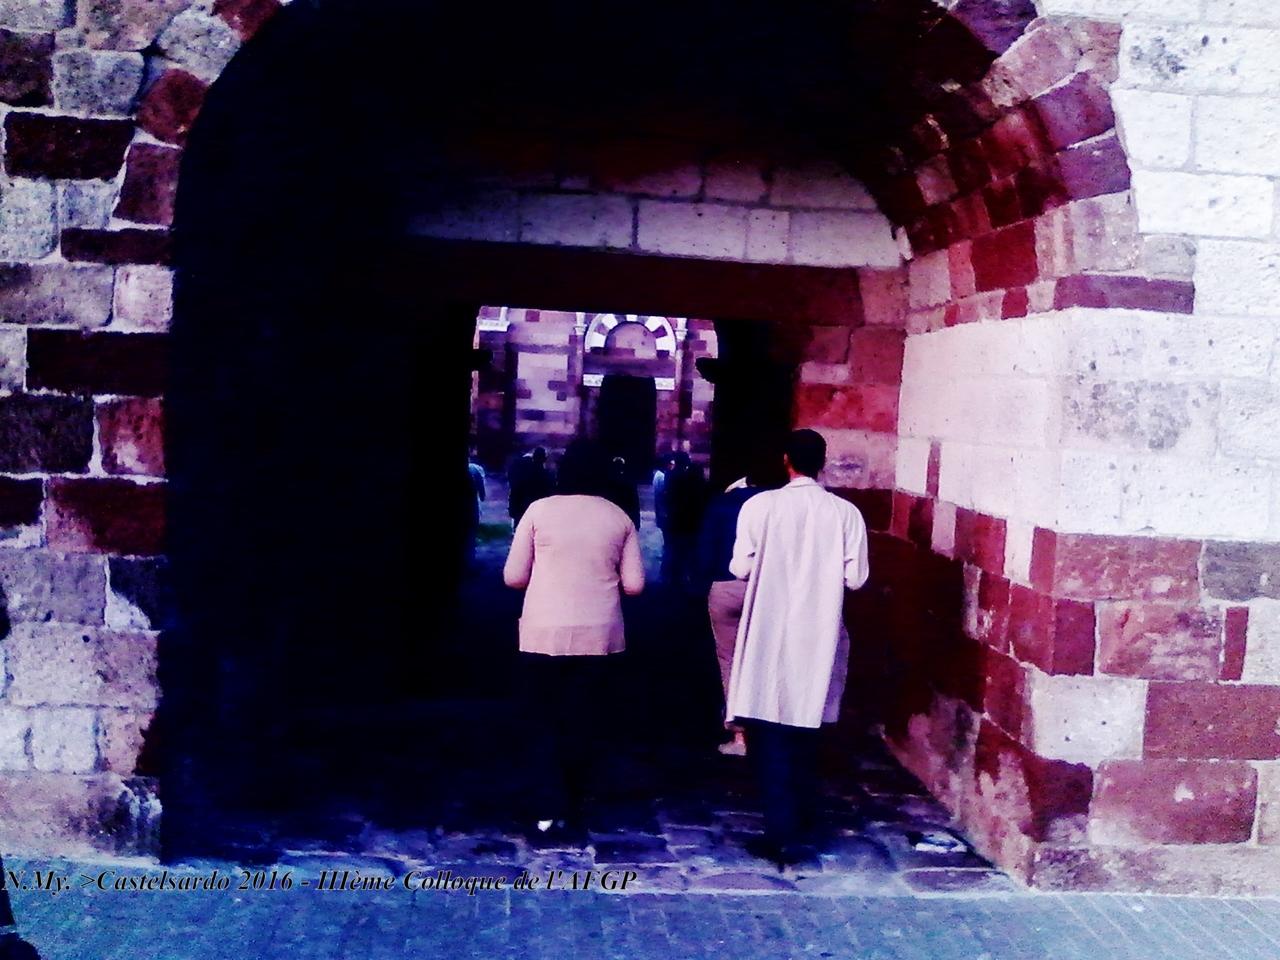 19 mai 2016 - Tergu - entrée du monastère